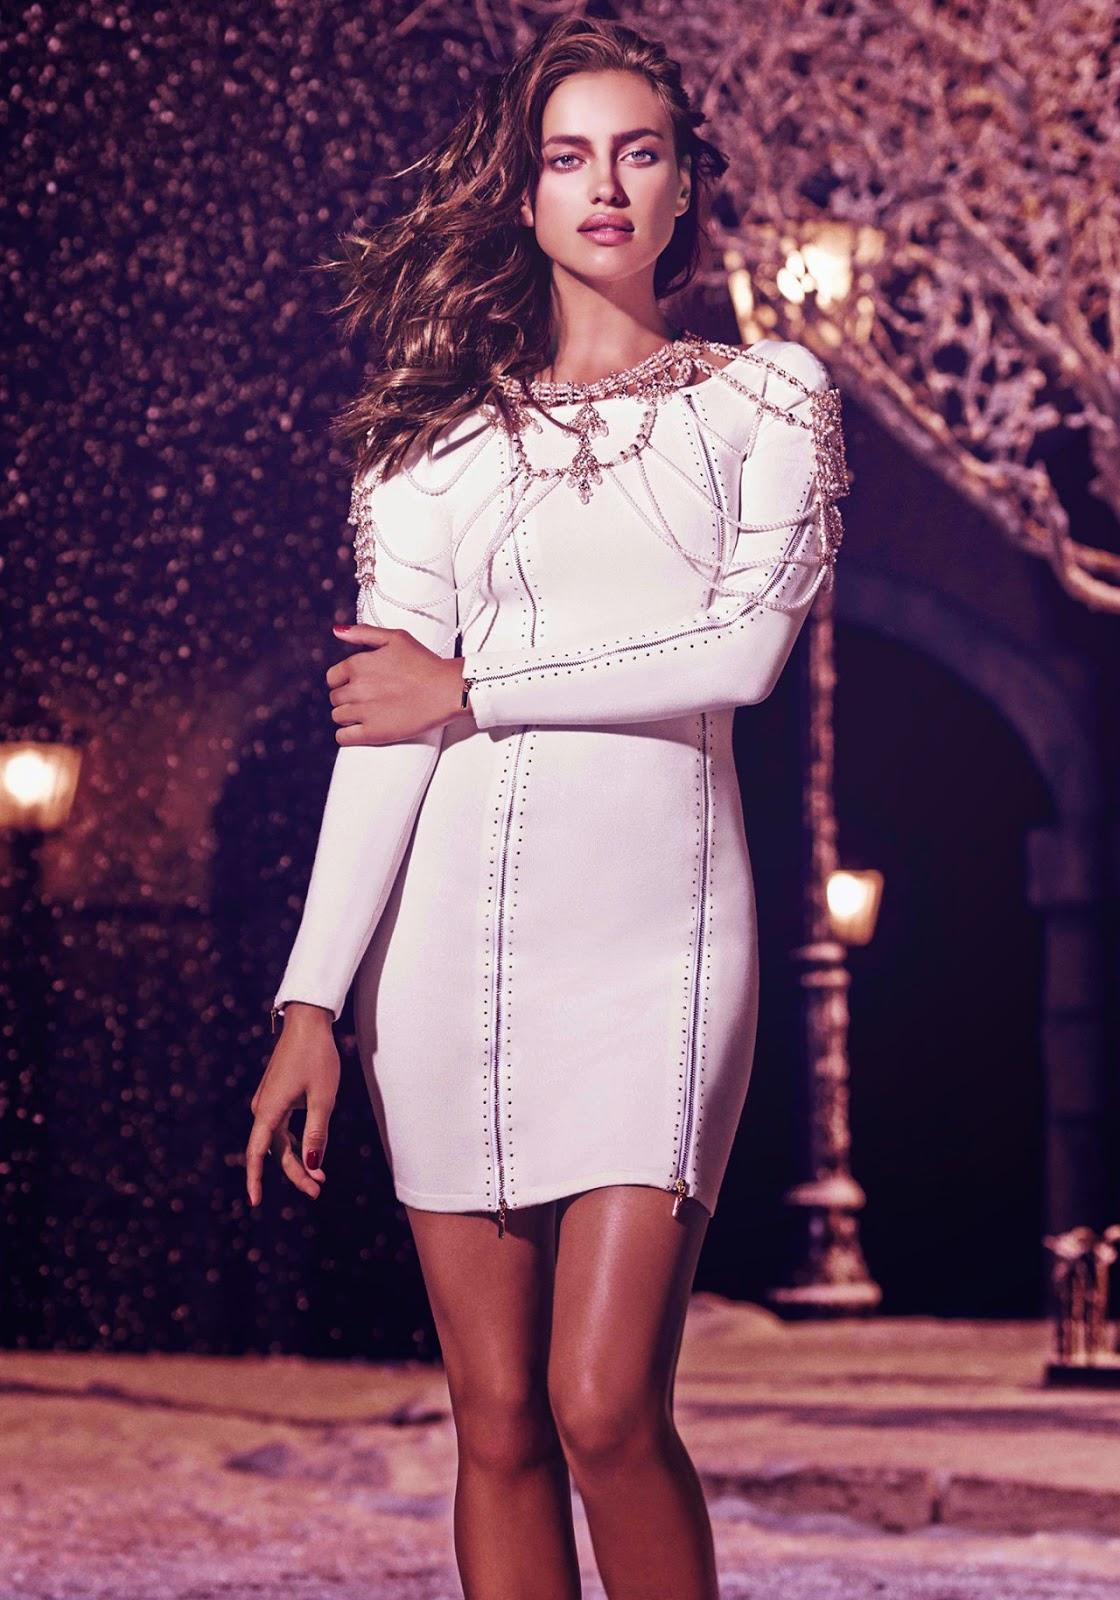 Irina Shayk for SuiteBlanco Holiday 2014 Campaign